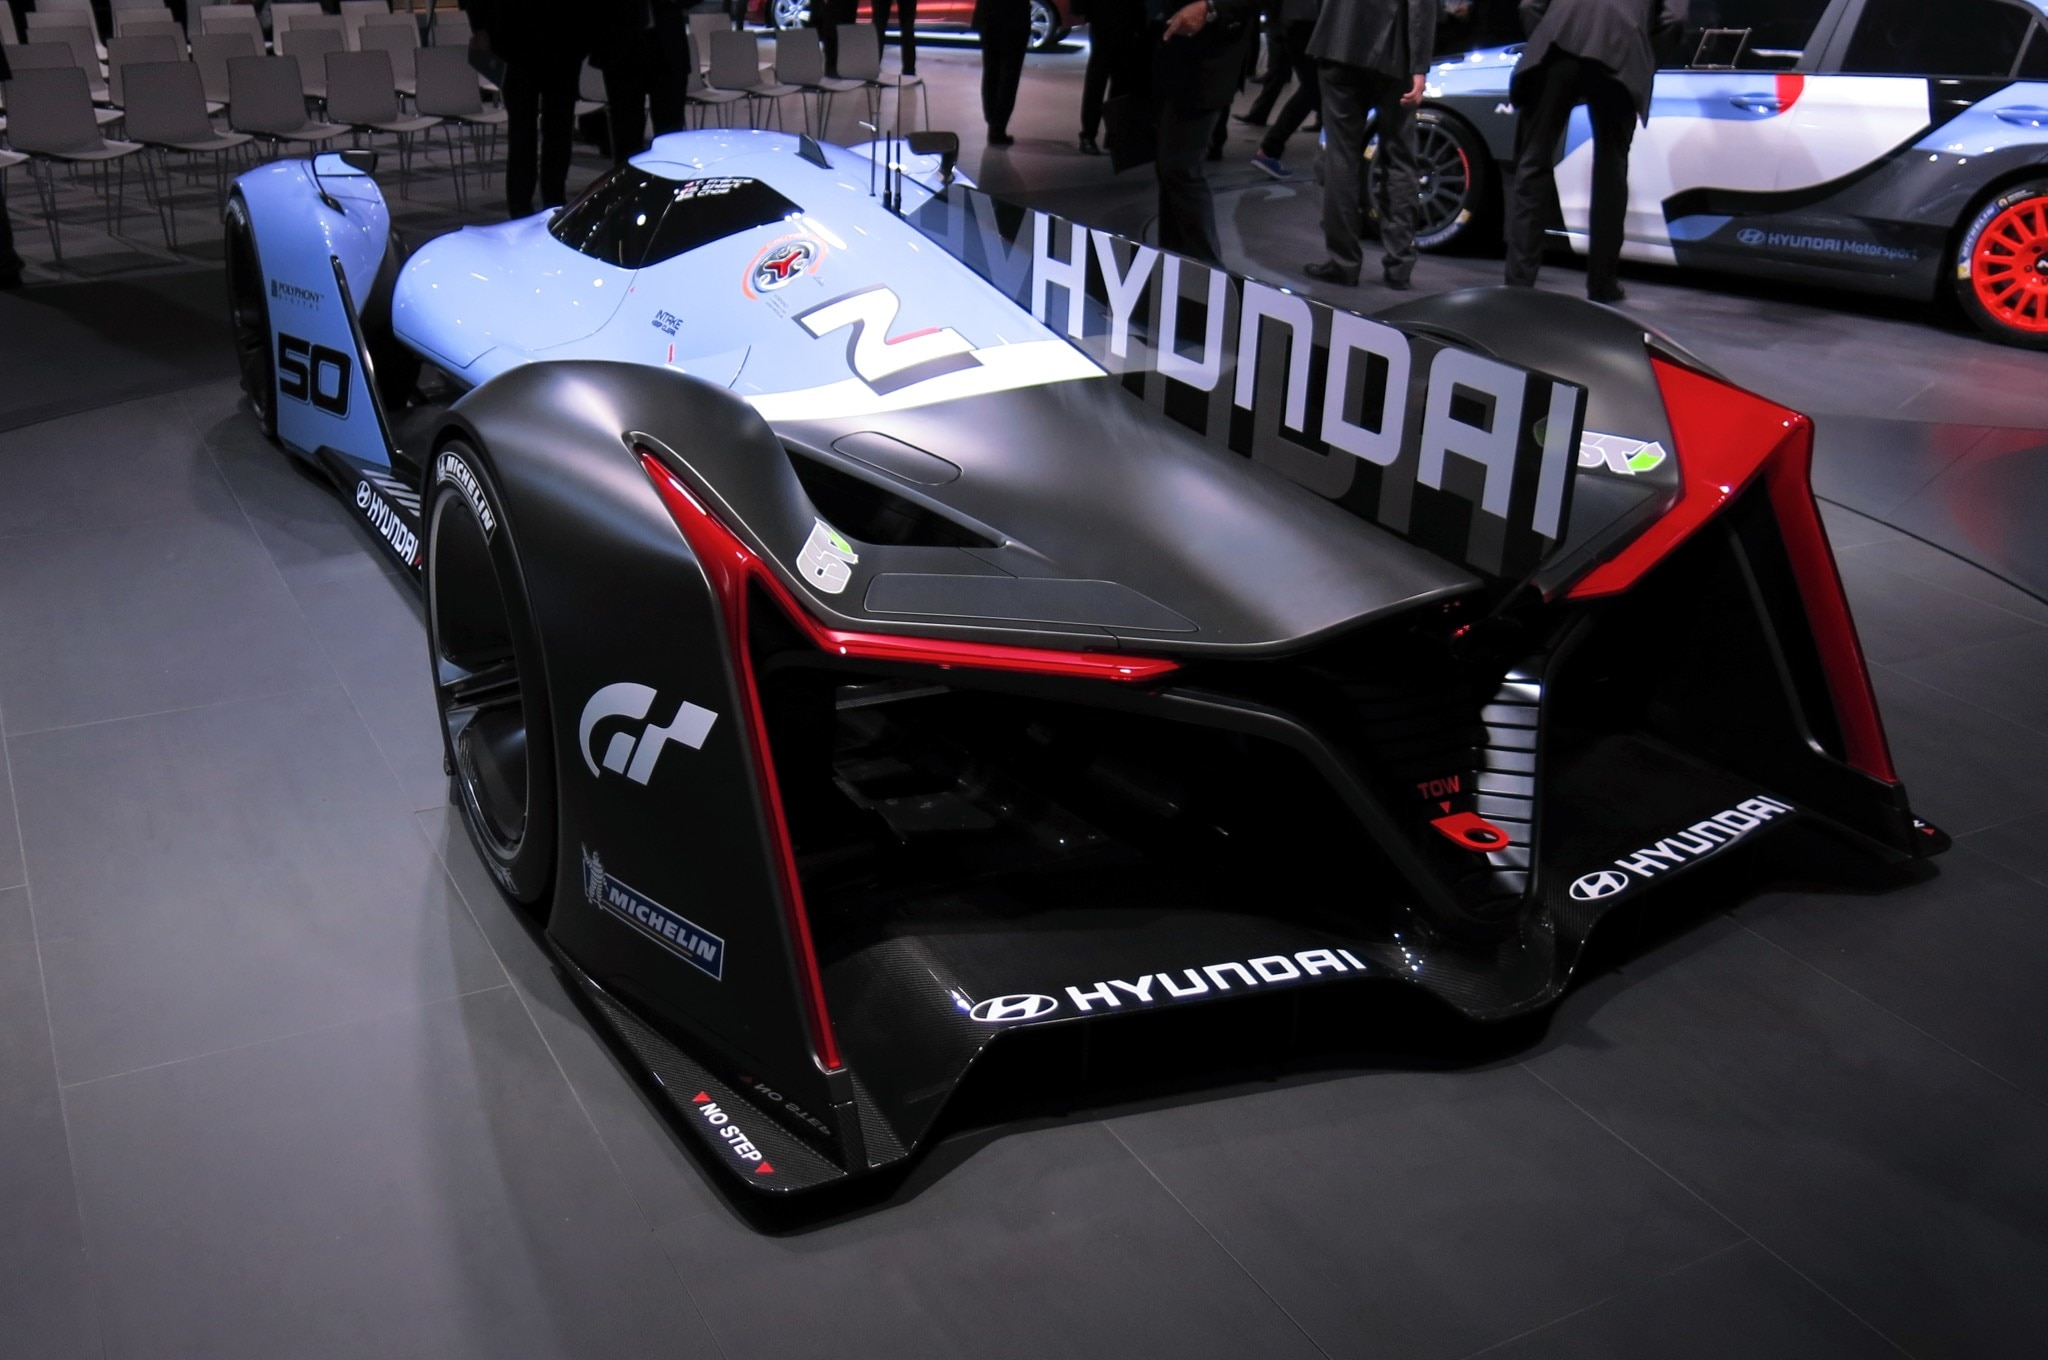 Free Cars Near Me >> Hyundai N 2025 Vision Gran Turismo Leads the Way for new N Sub-Brand